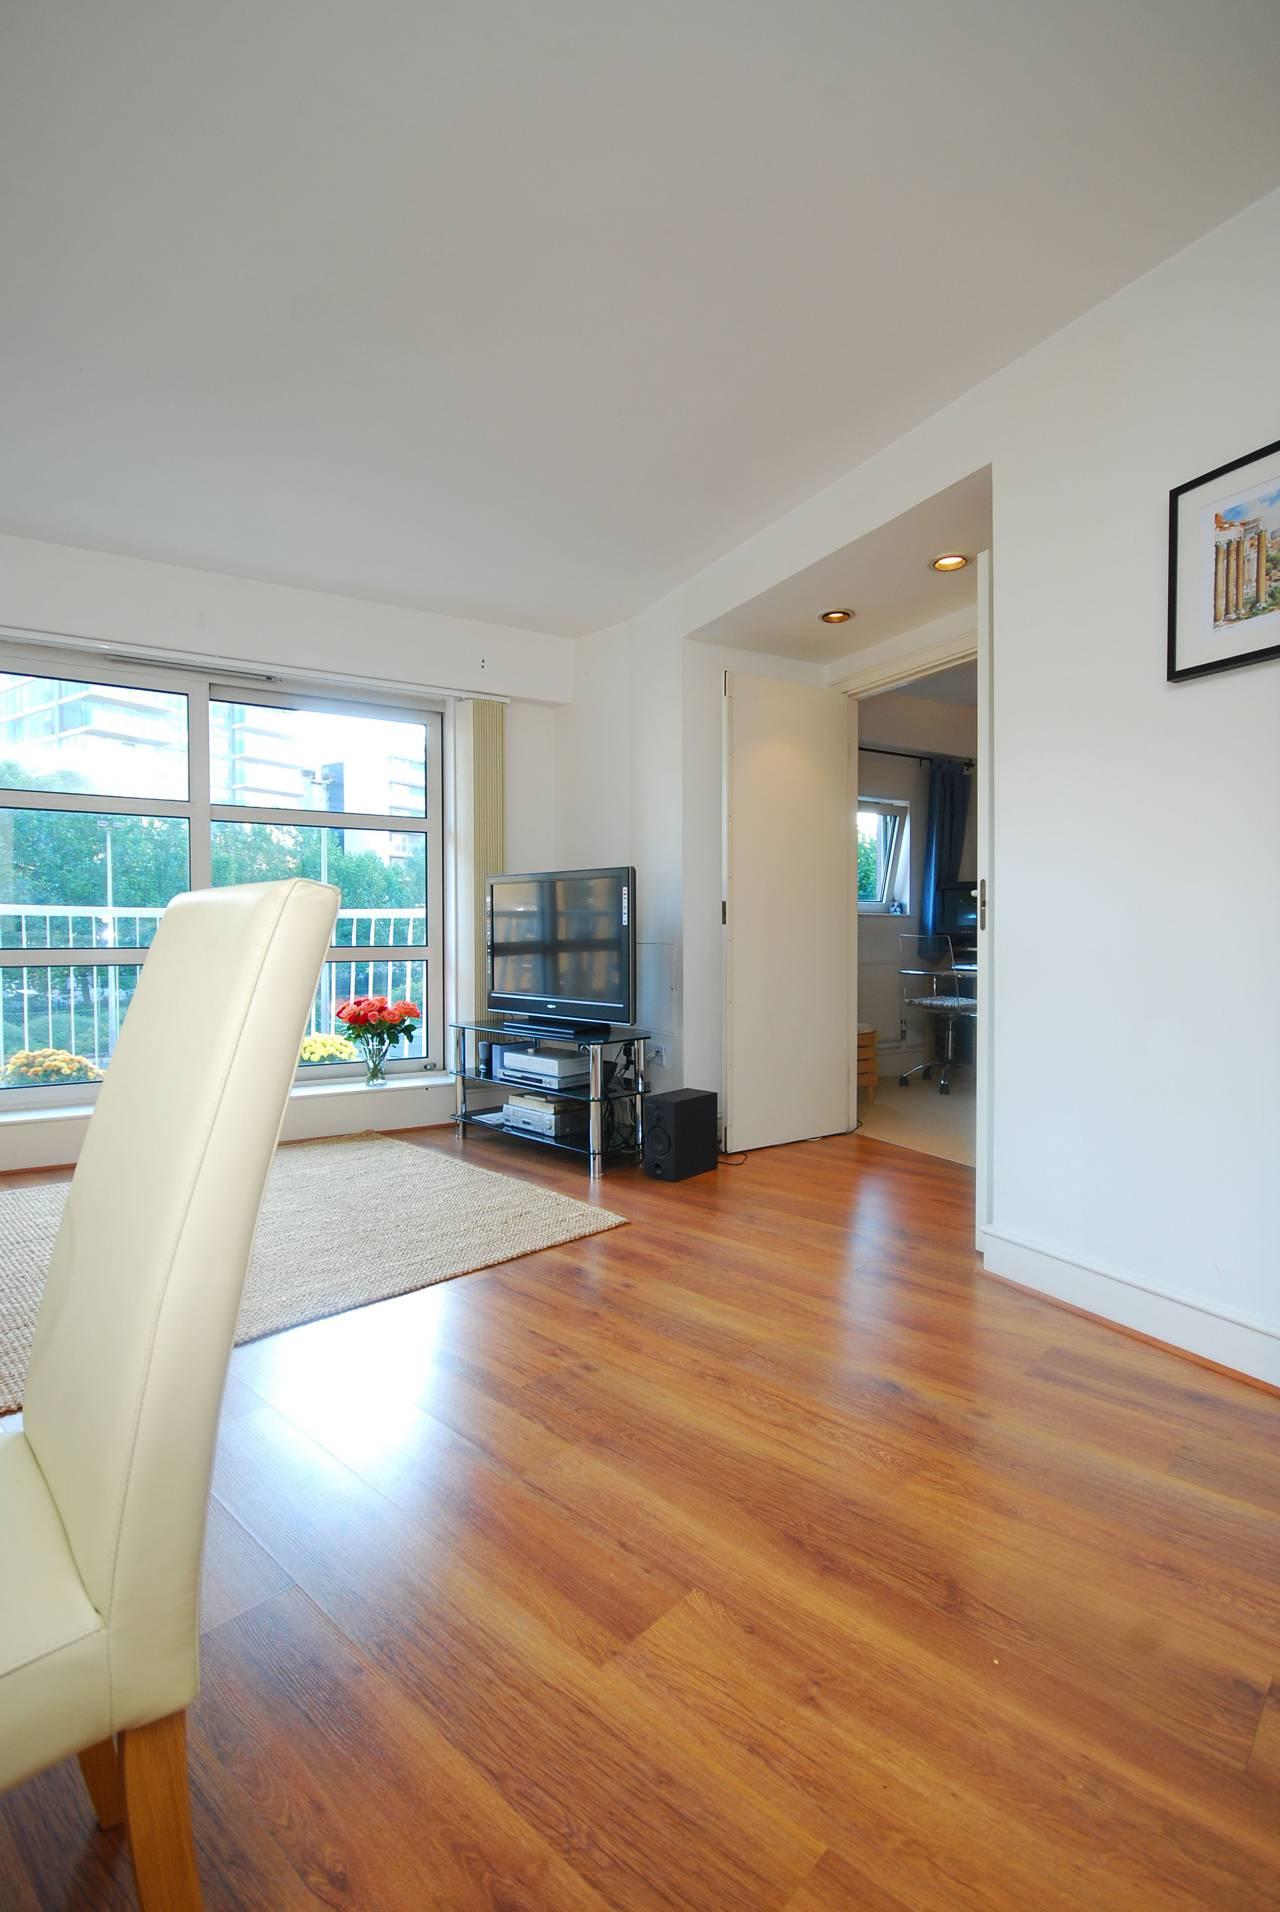 2 Bedroom Flat To Rent Cascades Tower Canary Wharf E E14 8jl